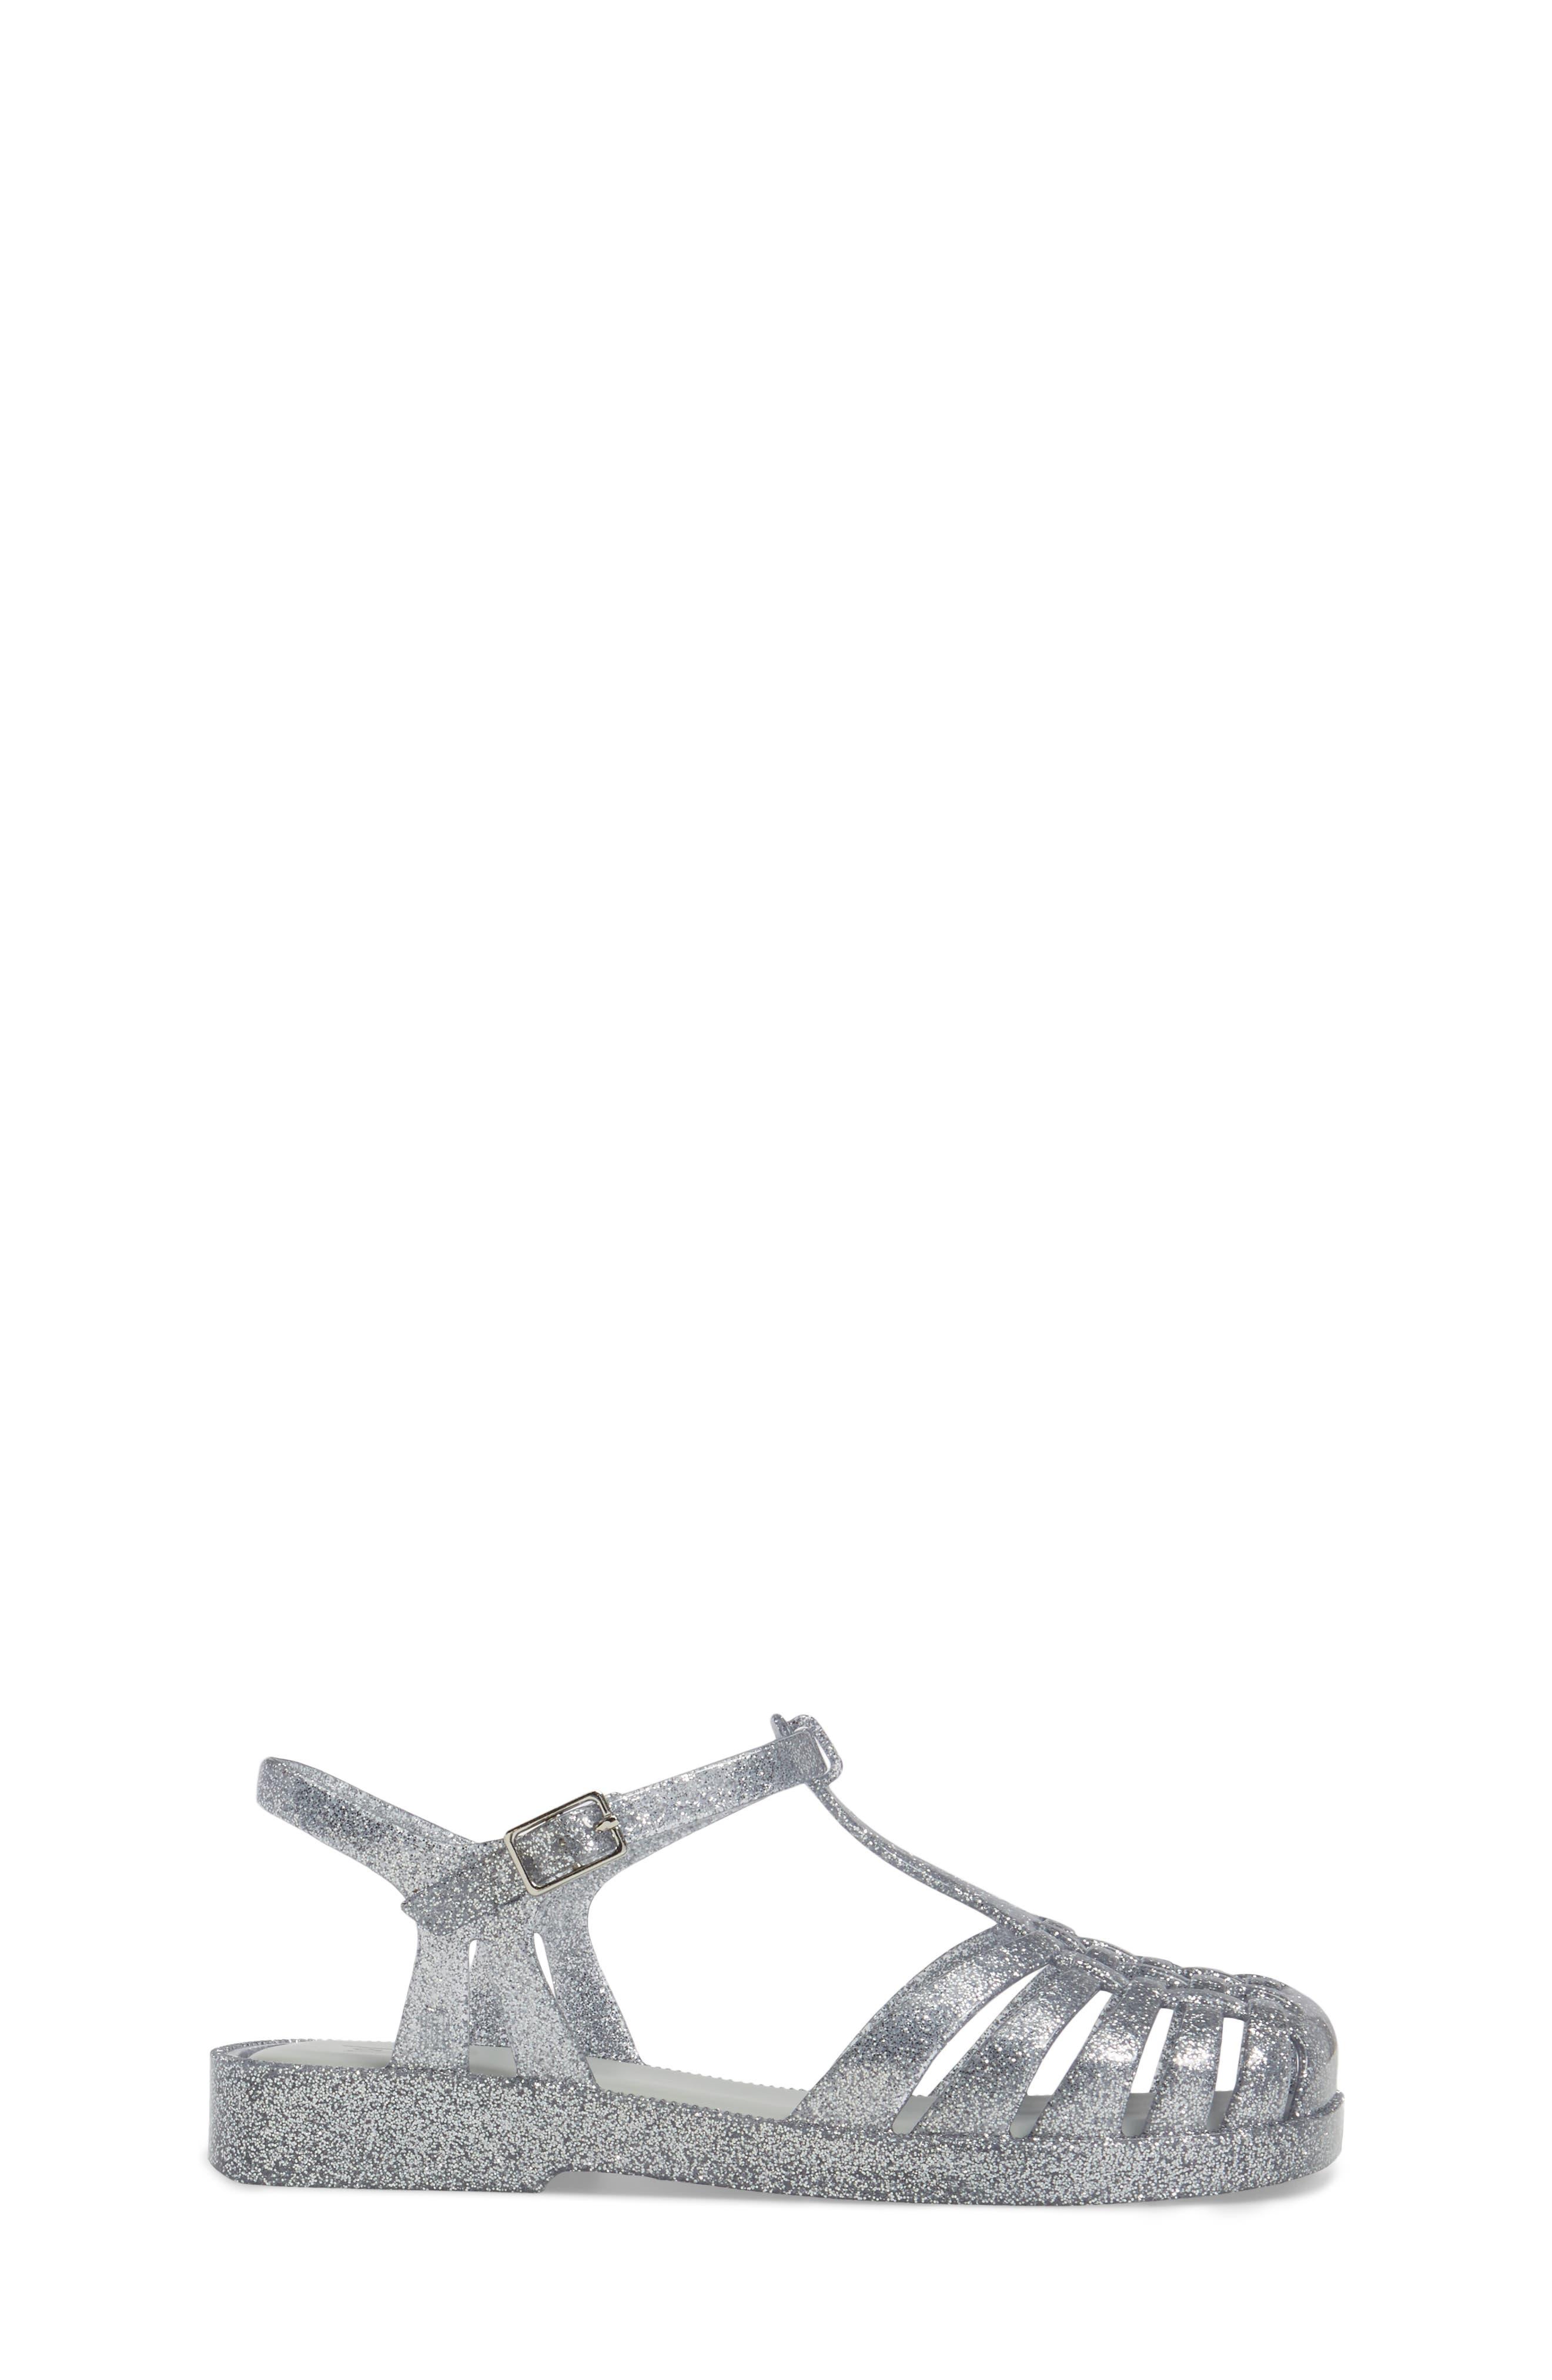 Aranha Quadrada Sandal,                             Alternate thumbnail 3, color,                             040